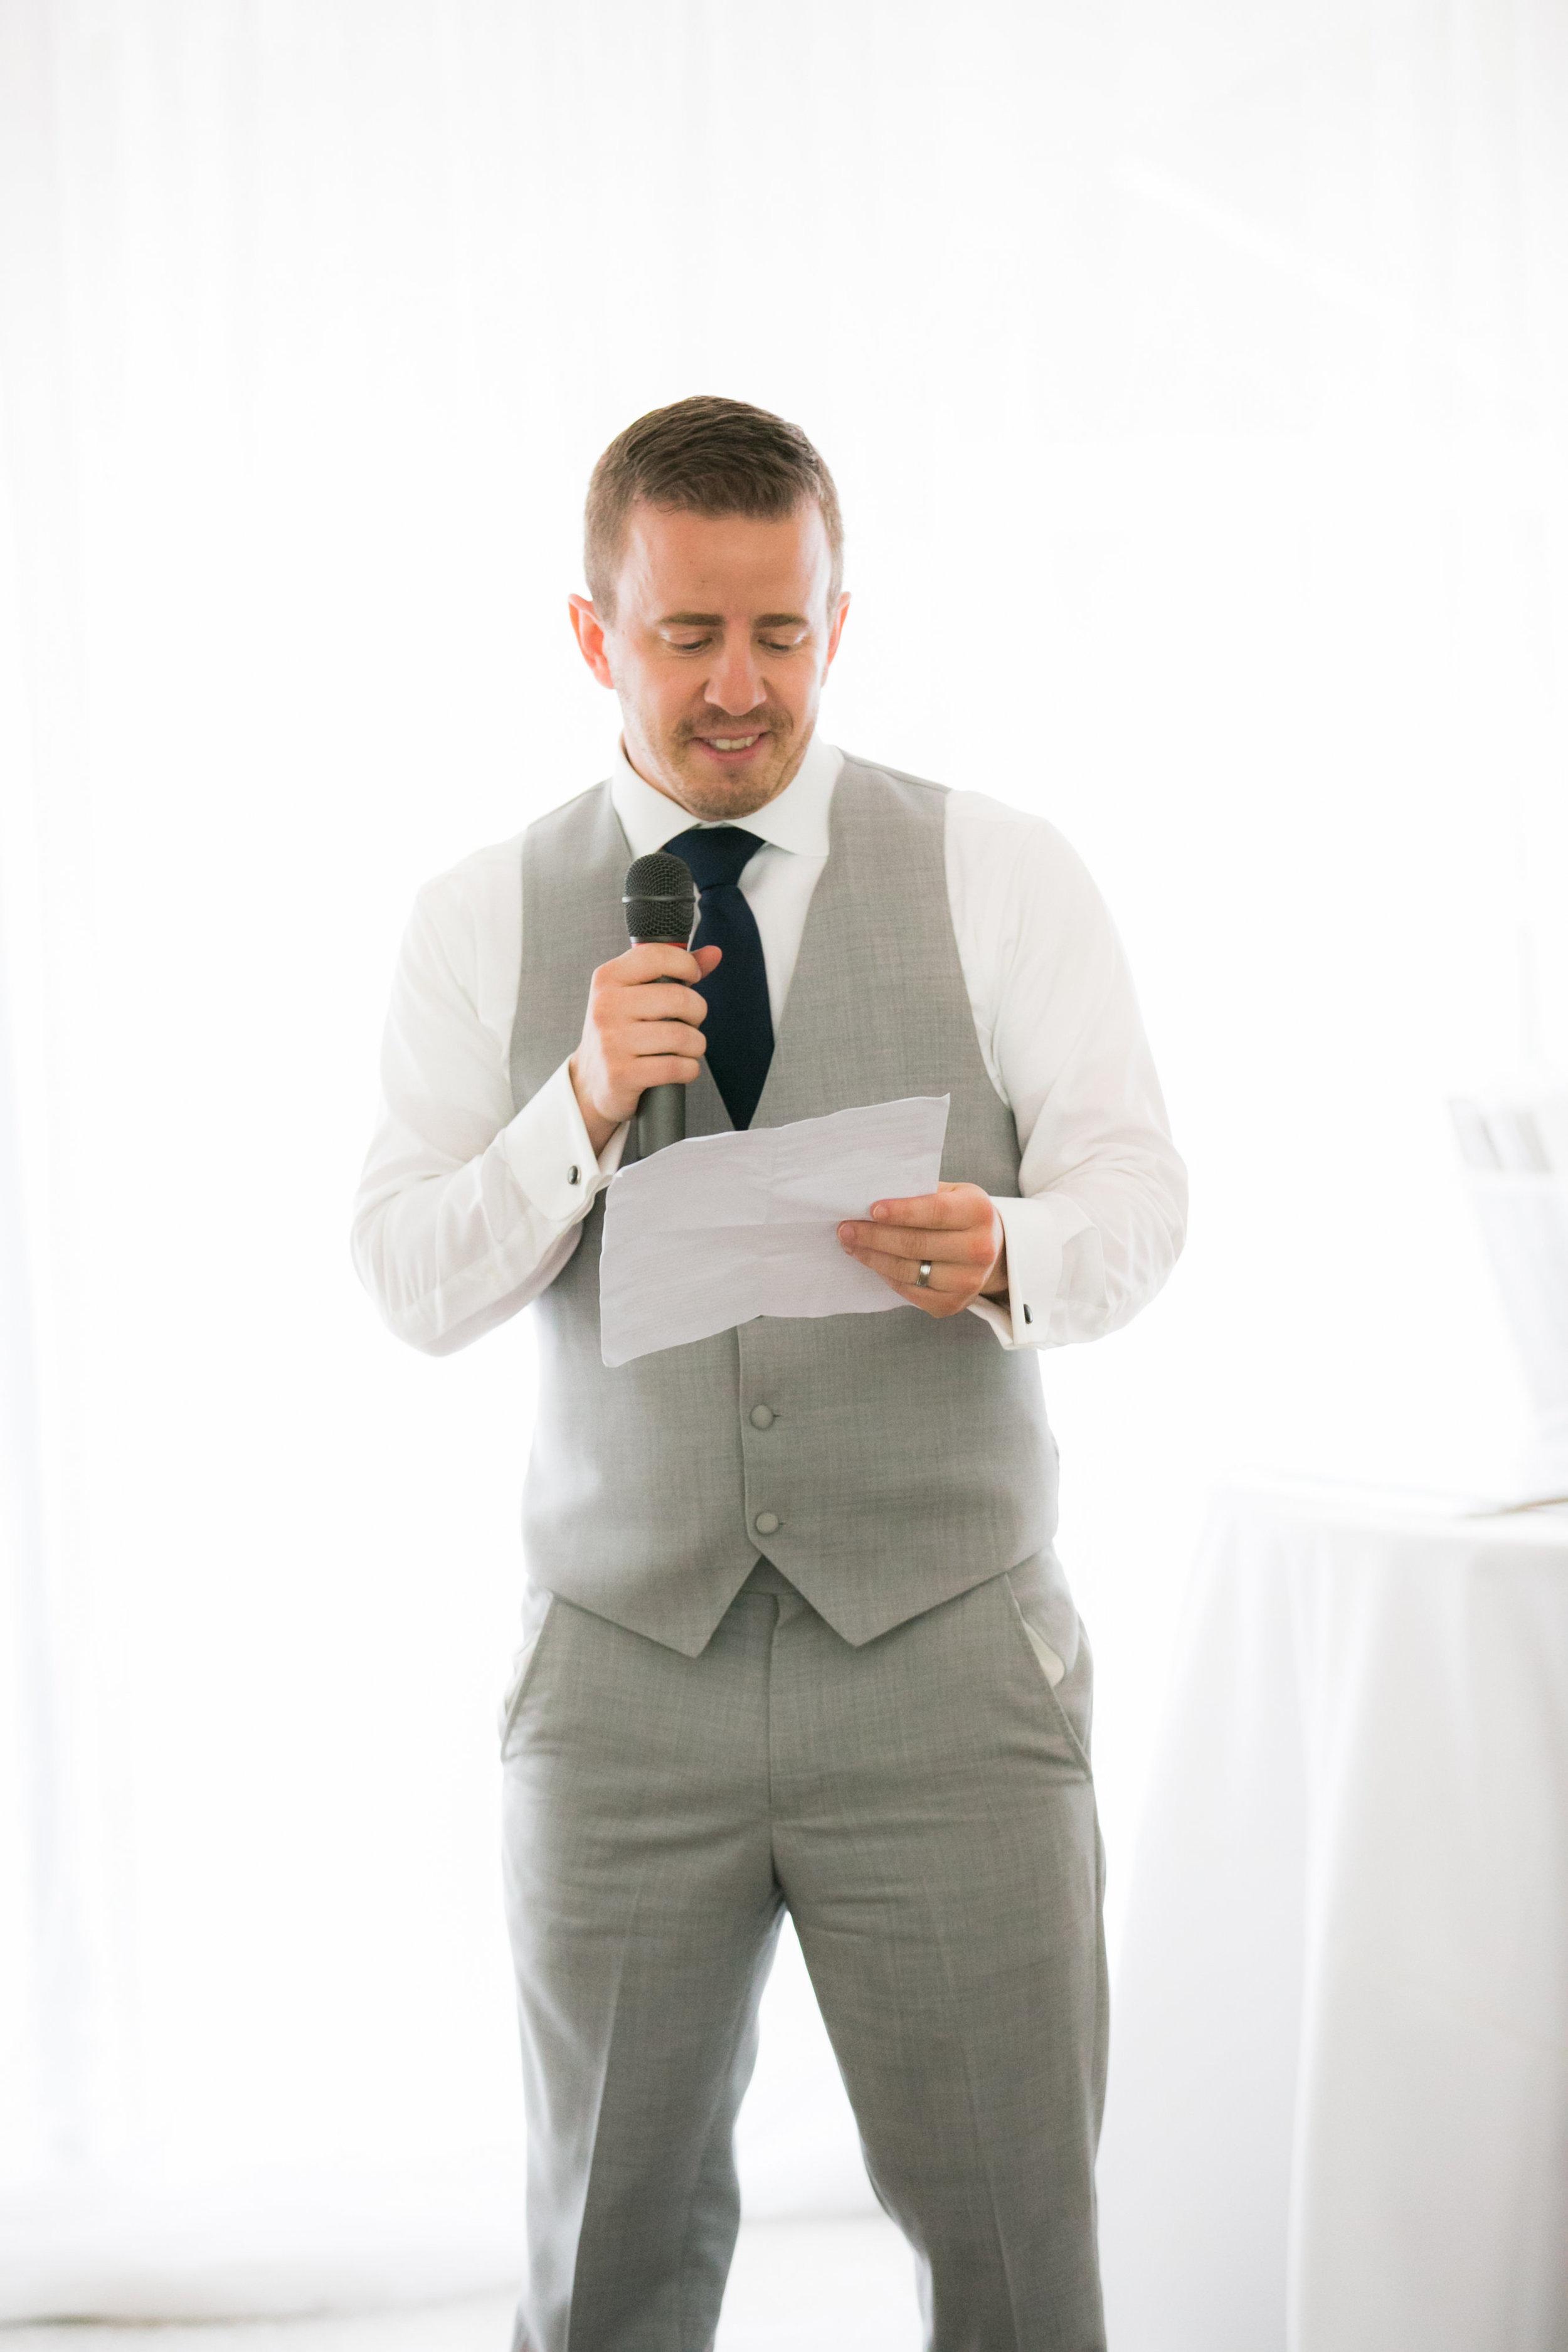 Pure elegance events Tynise Kee dc wedding planner va wedding planner rust manor house leesburg -0062.jpg